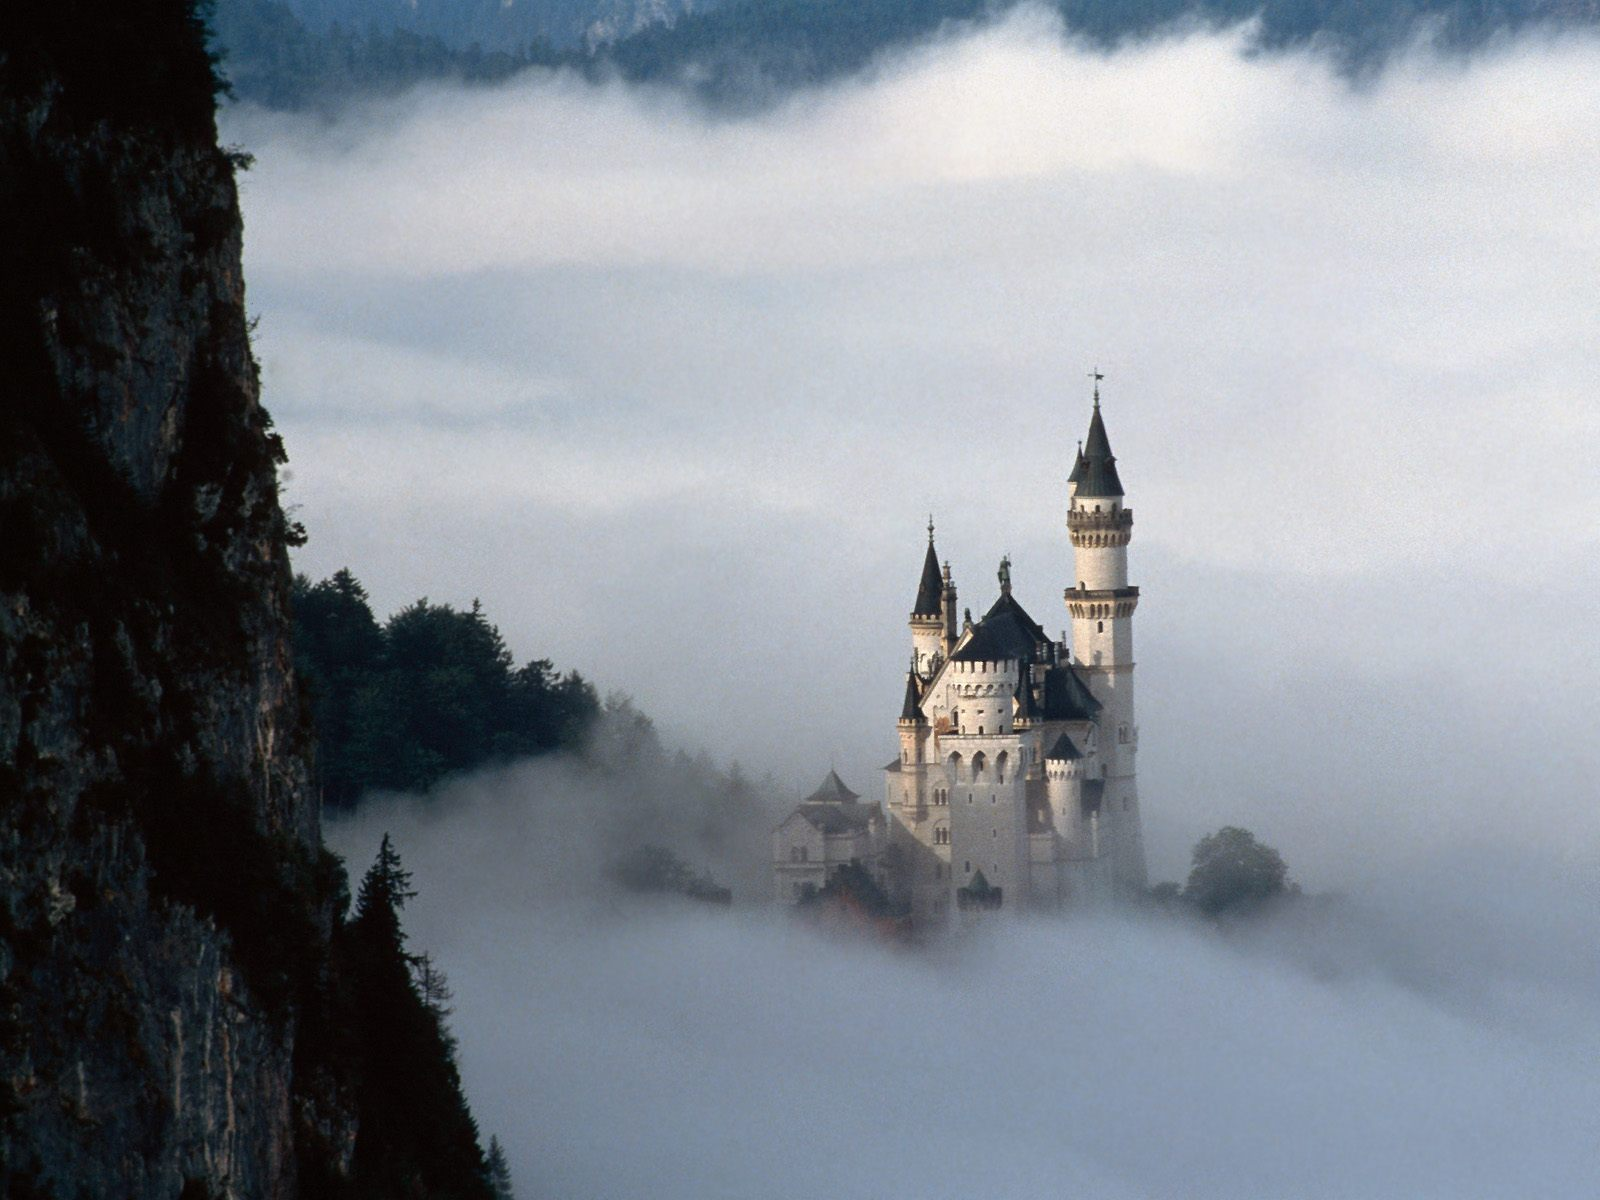 The Swan King's Castles Neuschwanstein– Germany (6)